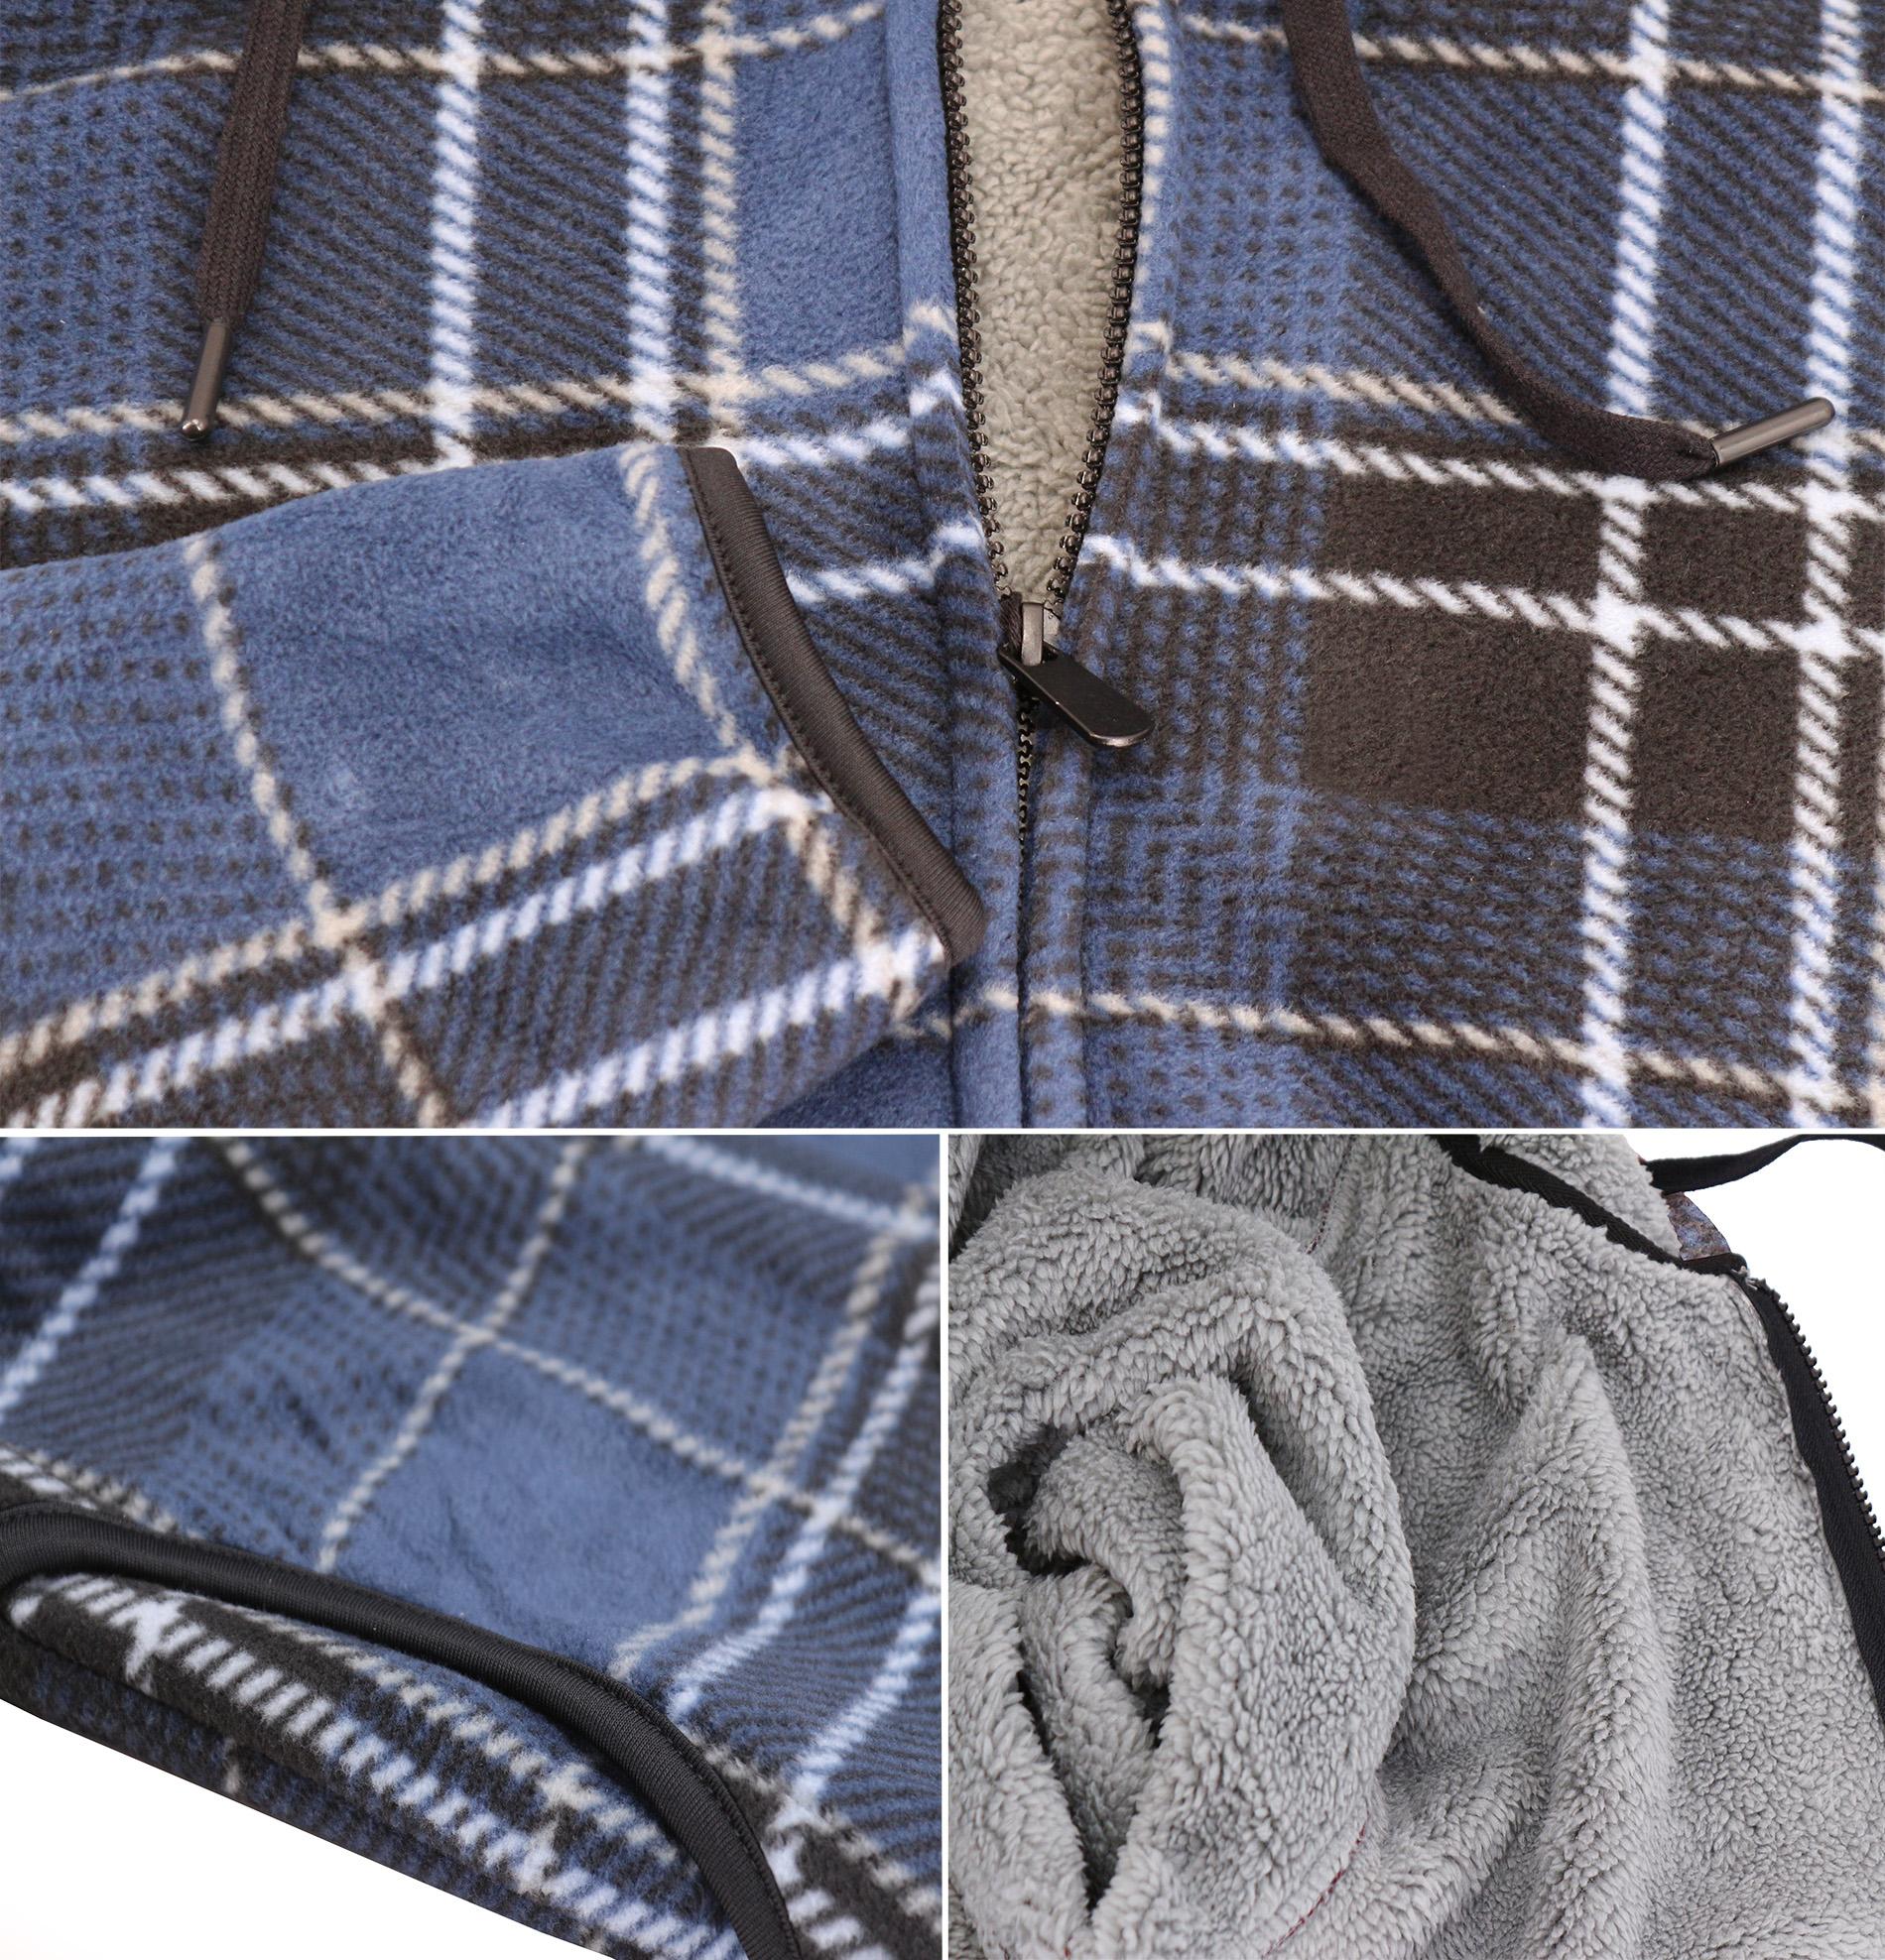 thumbnail 19 - Men-039-s-Casual-Flannel-Zip-Up-Fleece-Lined-Plaid-Sherpa-Hoodie-Lightweight-Jacket